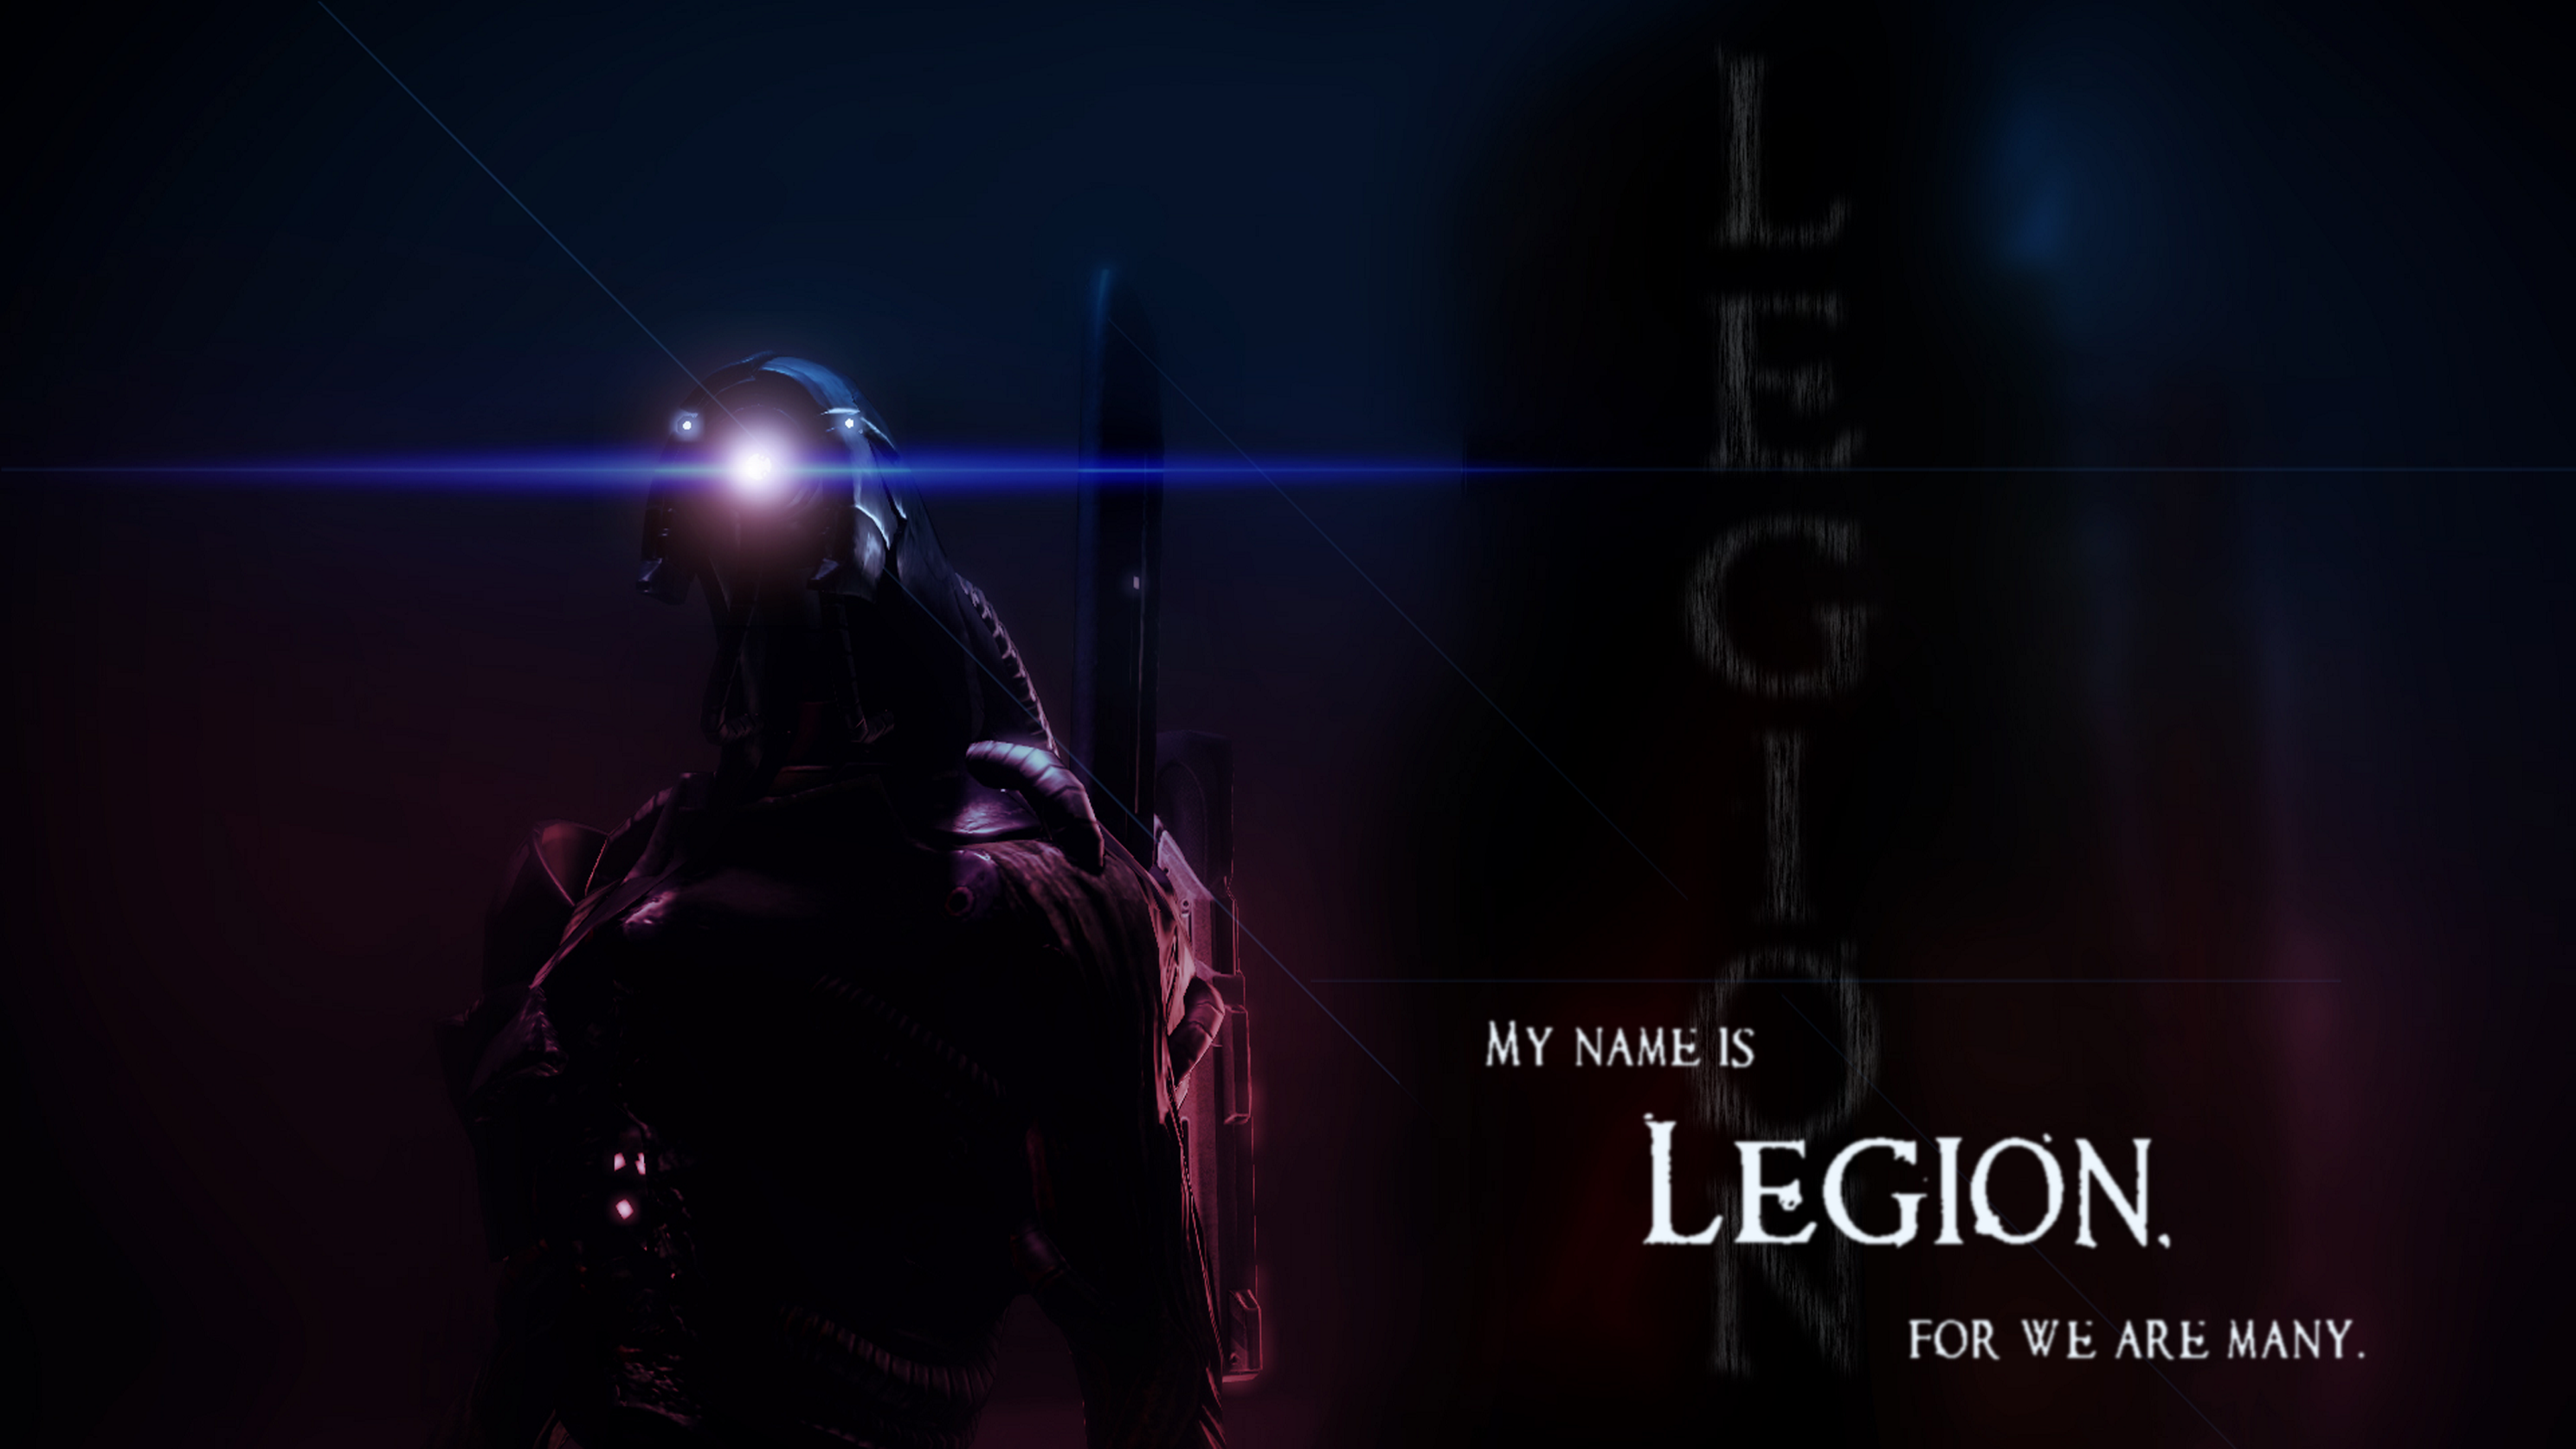 Legion Mass Effect 3840x2160